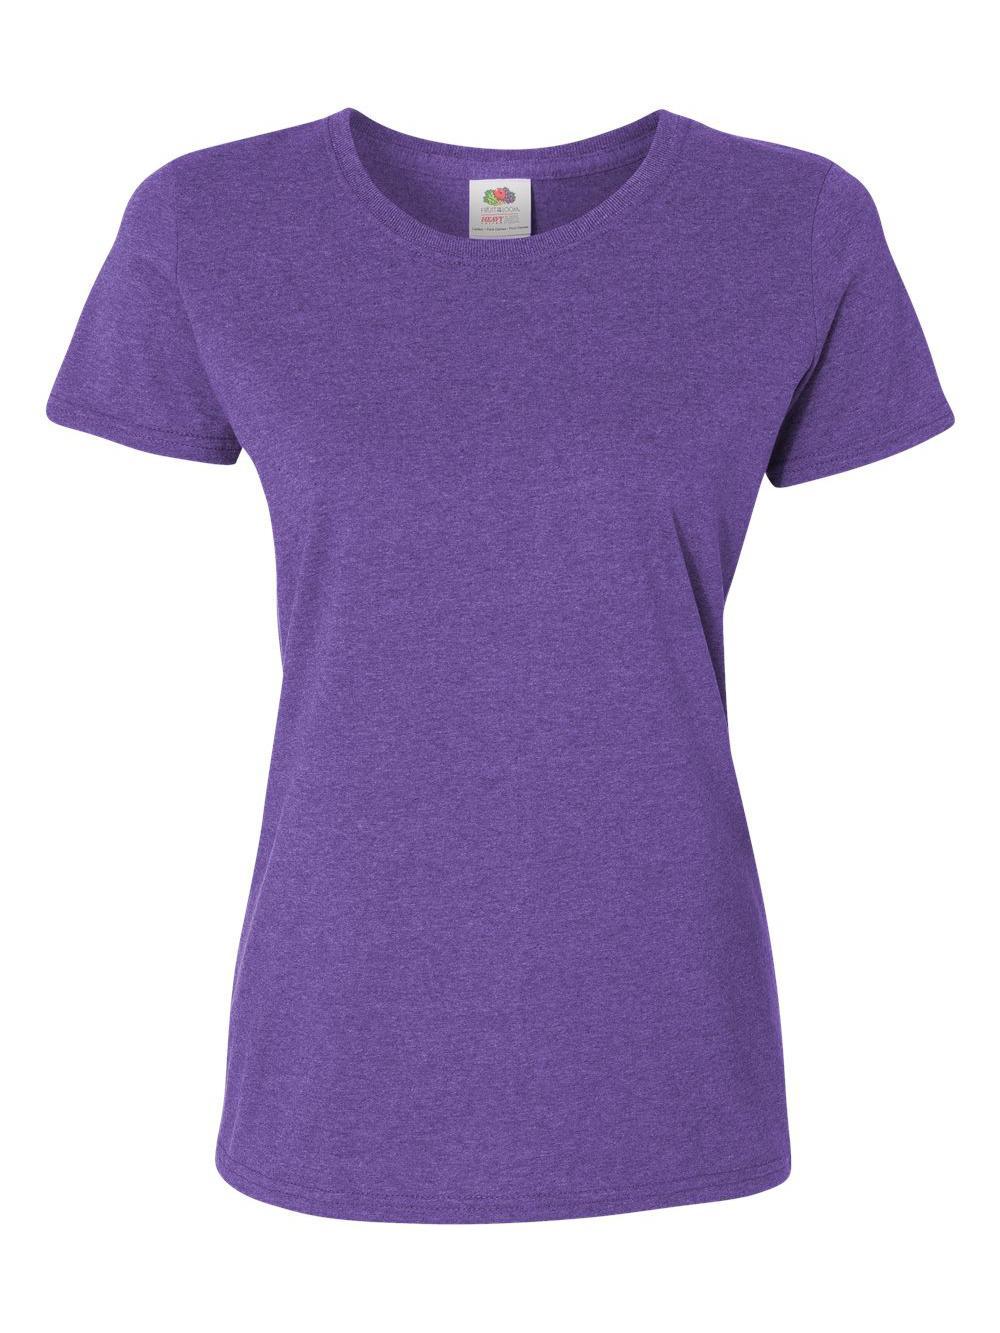 Fruit-of-the-Loom-HD-Cotton-Women-039-s-Short-Sleeve-T-Shirt-L3930R thumbnail 30